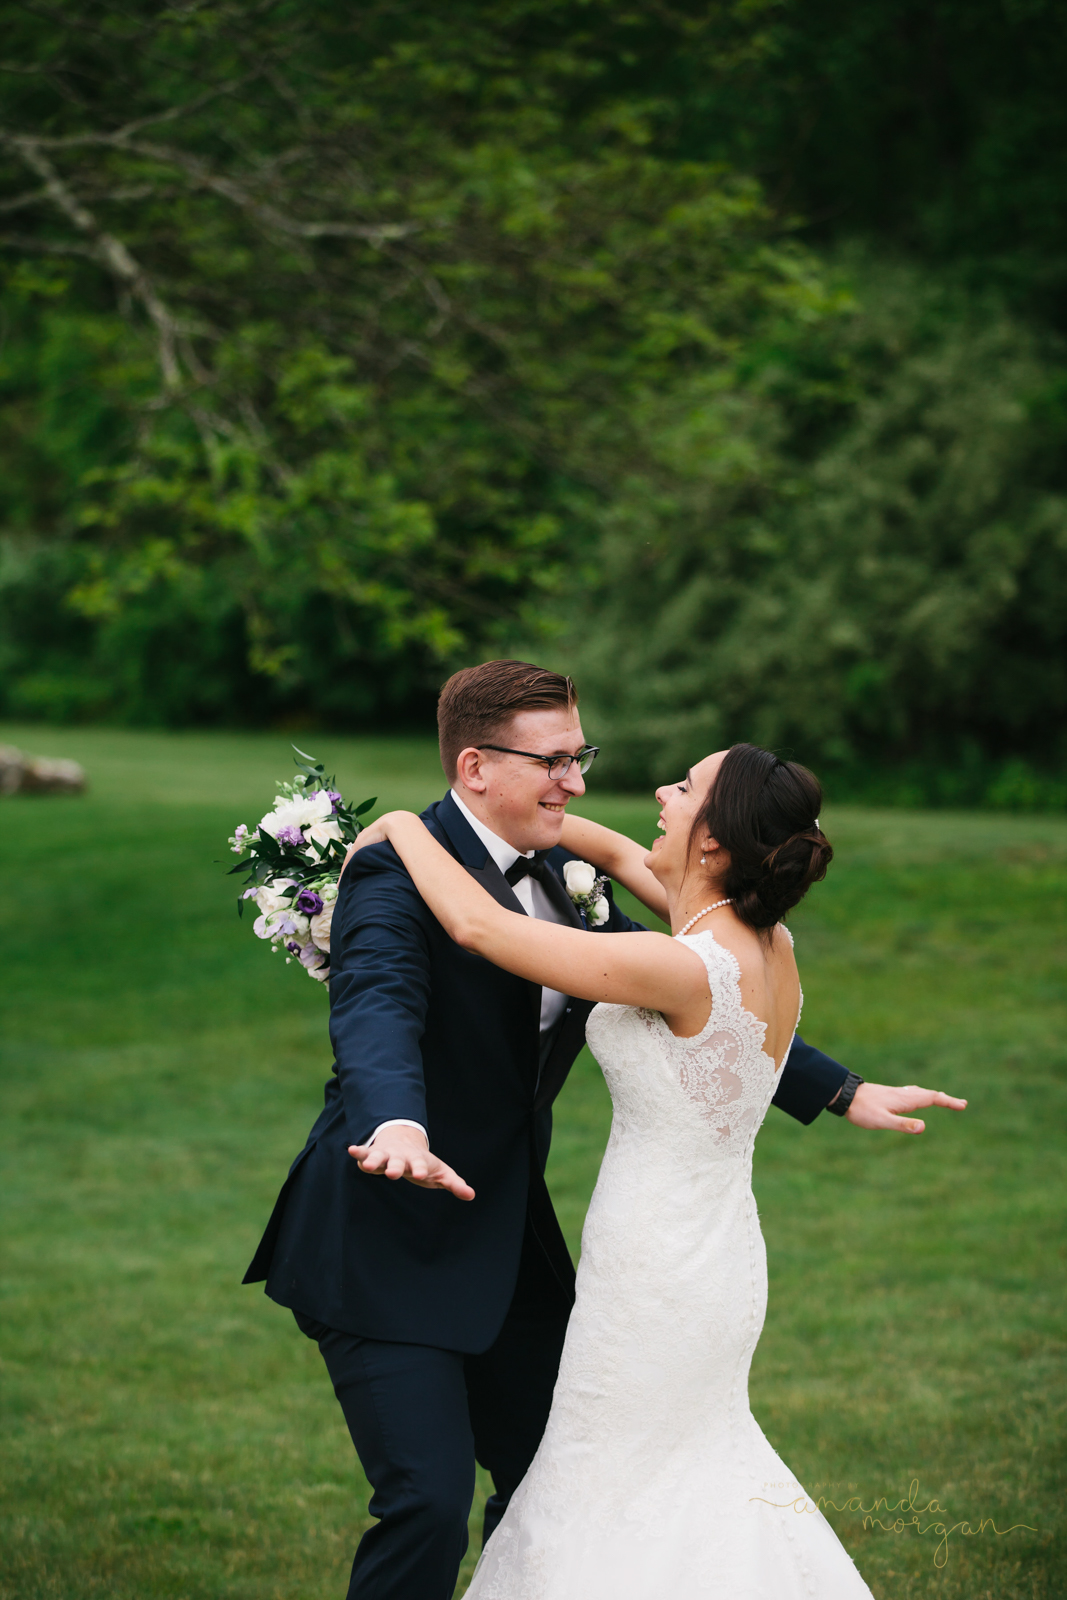 Publick-House-Wedding-Amanda-Morgan-34.jpg